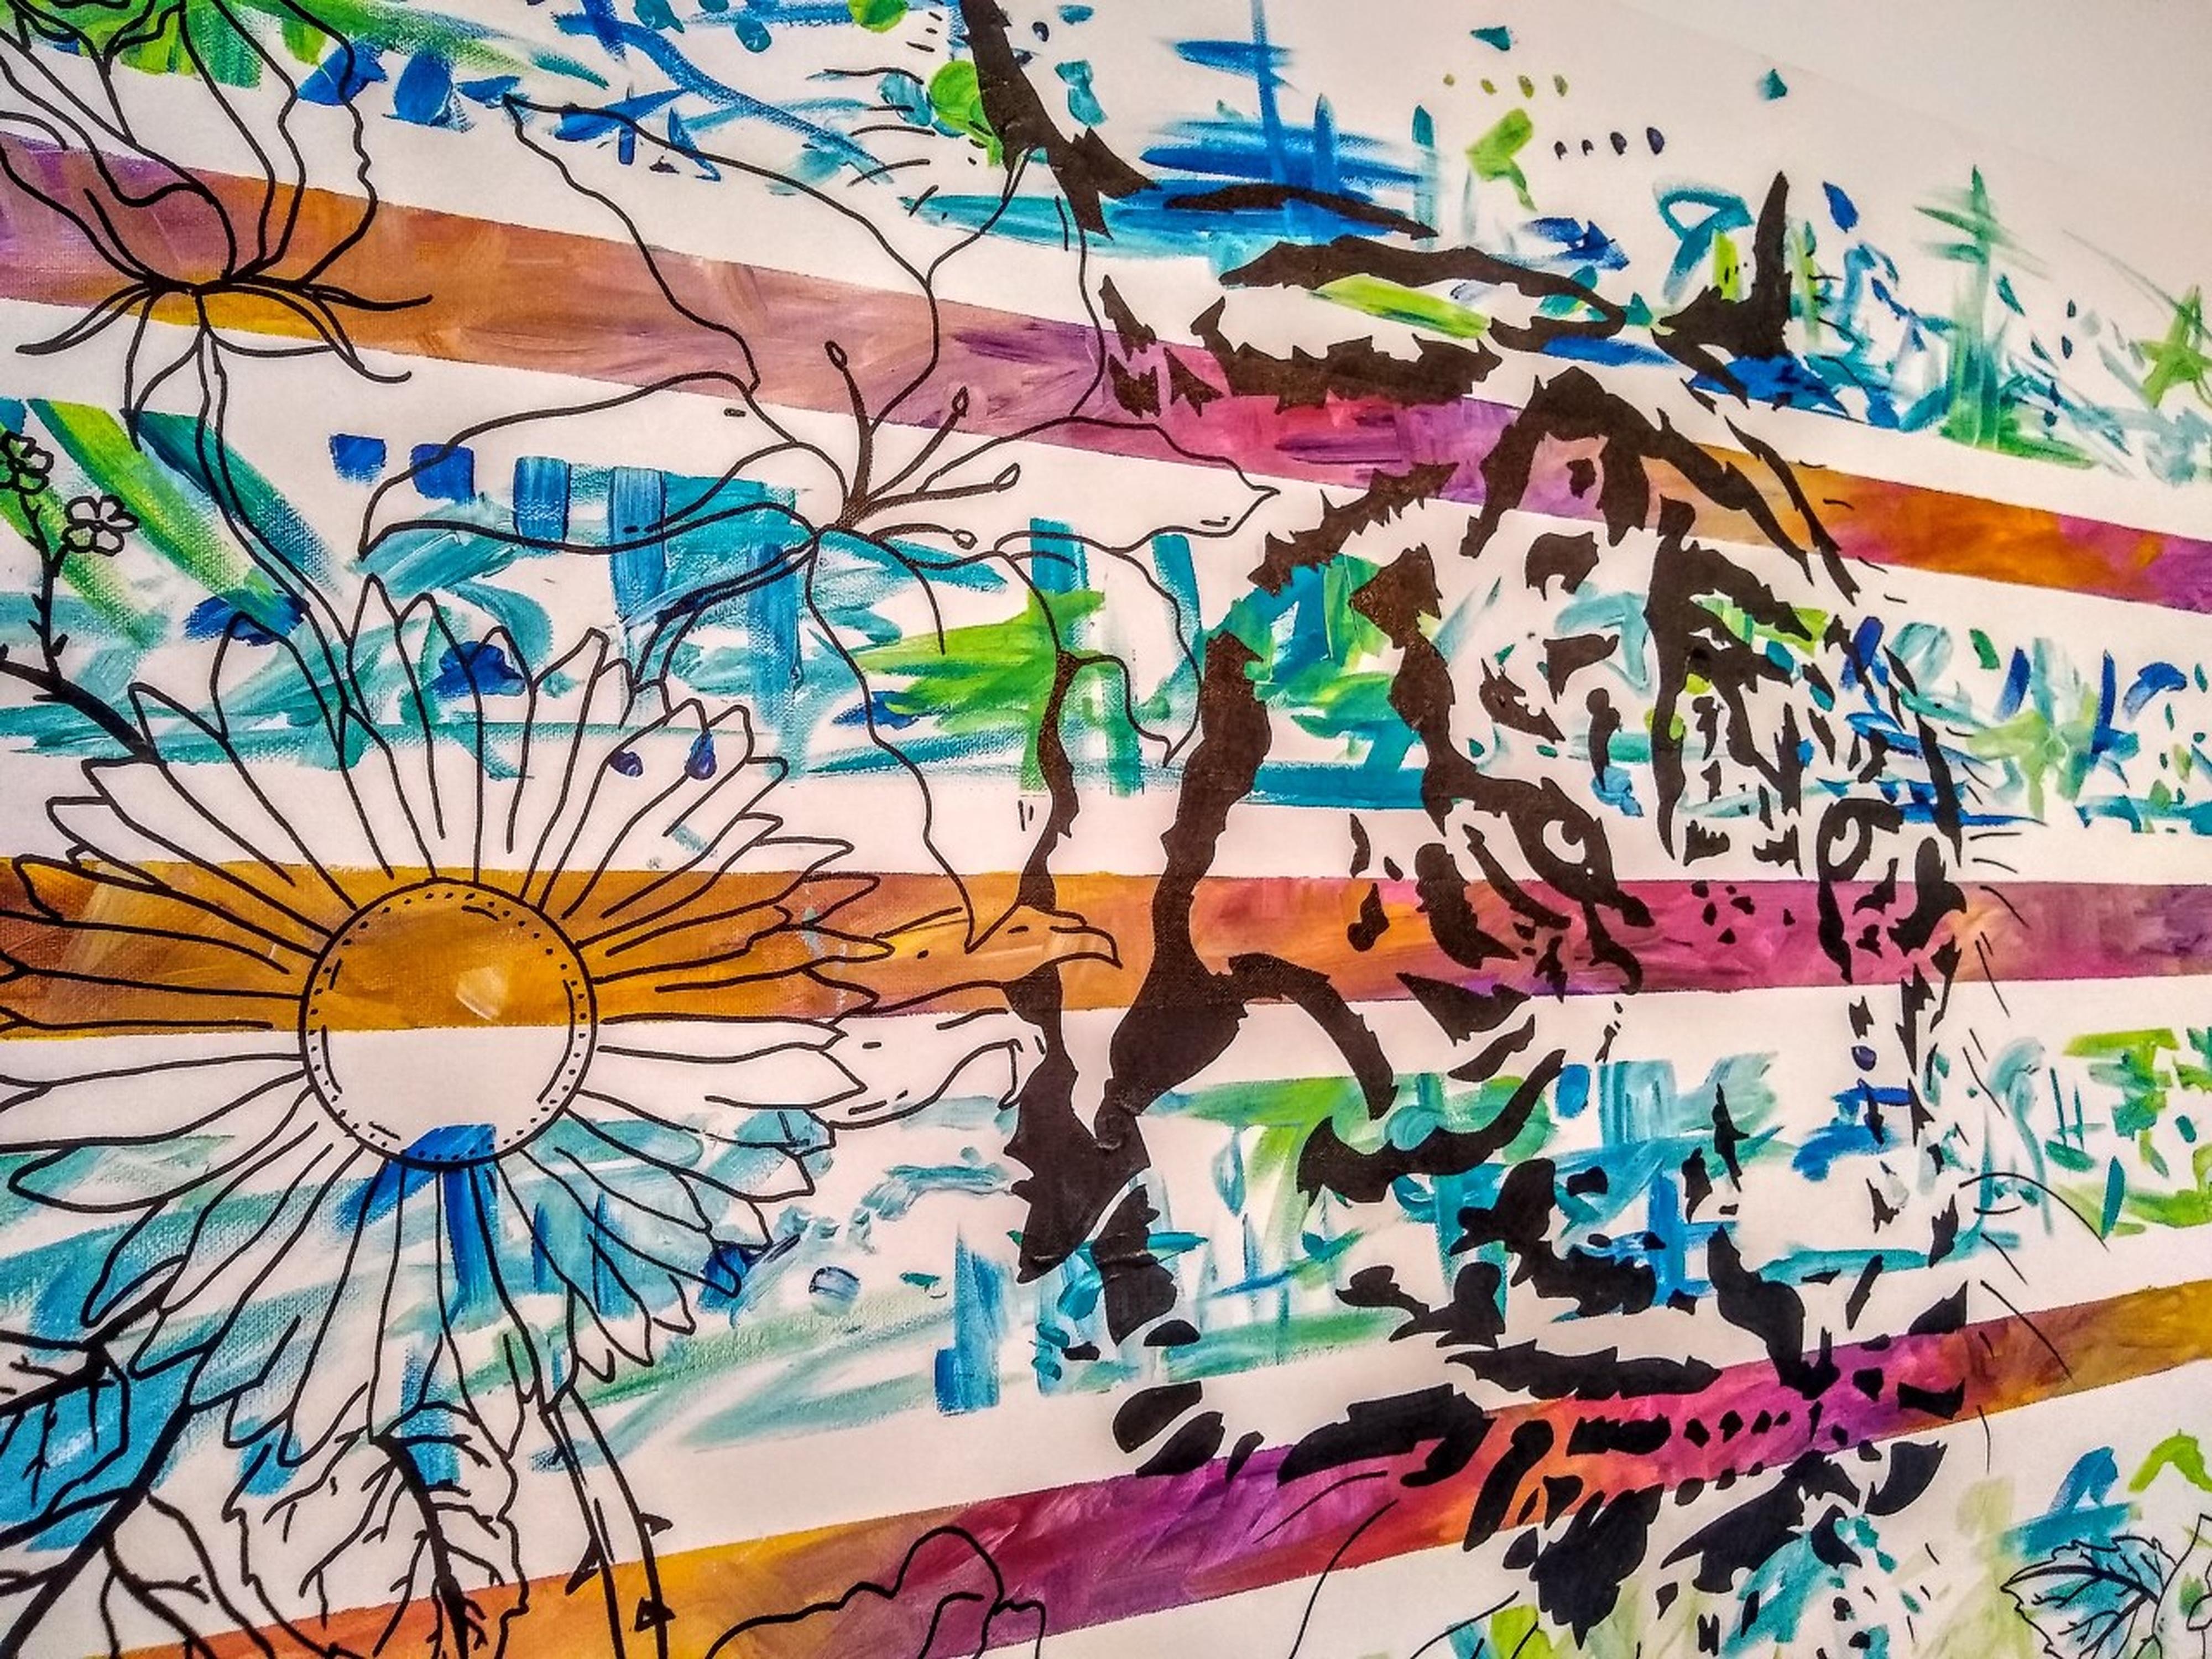 Tiger Lilly by Dane Hyman | ArtworkNetwork.com